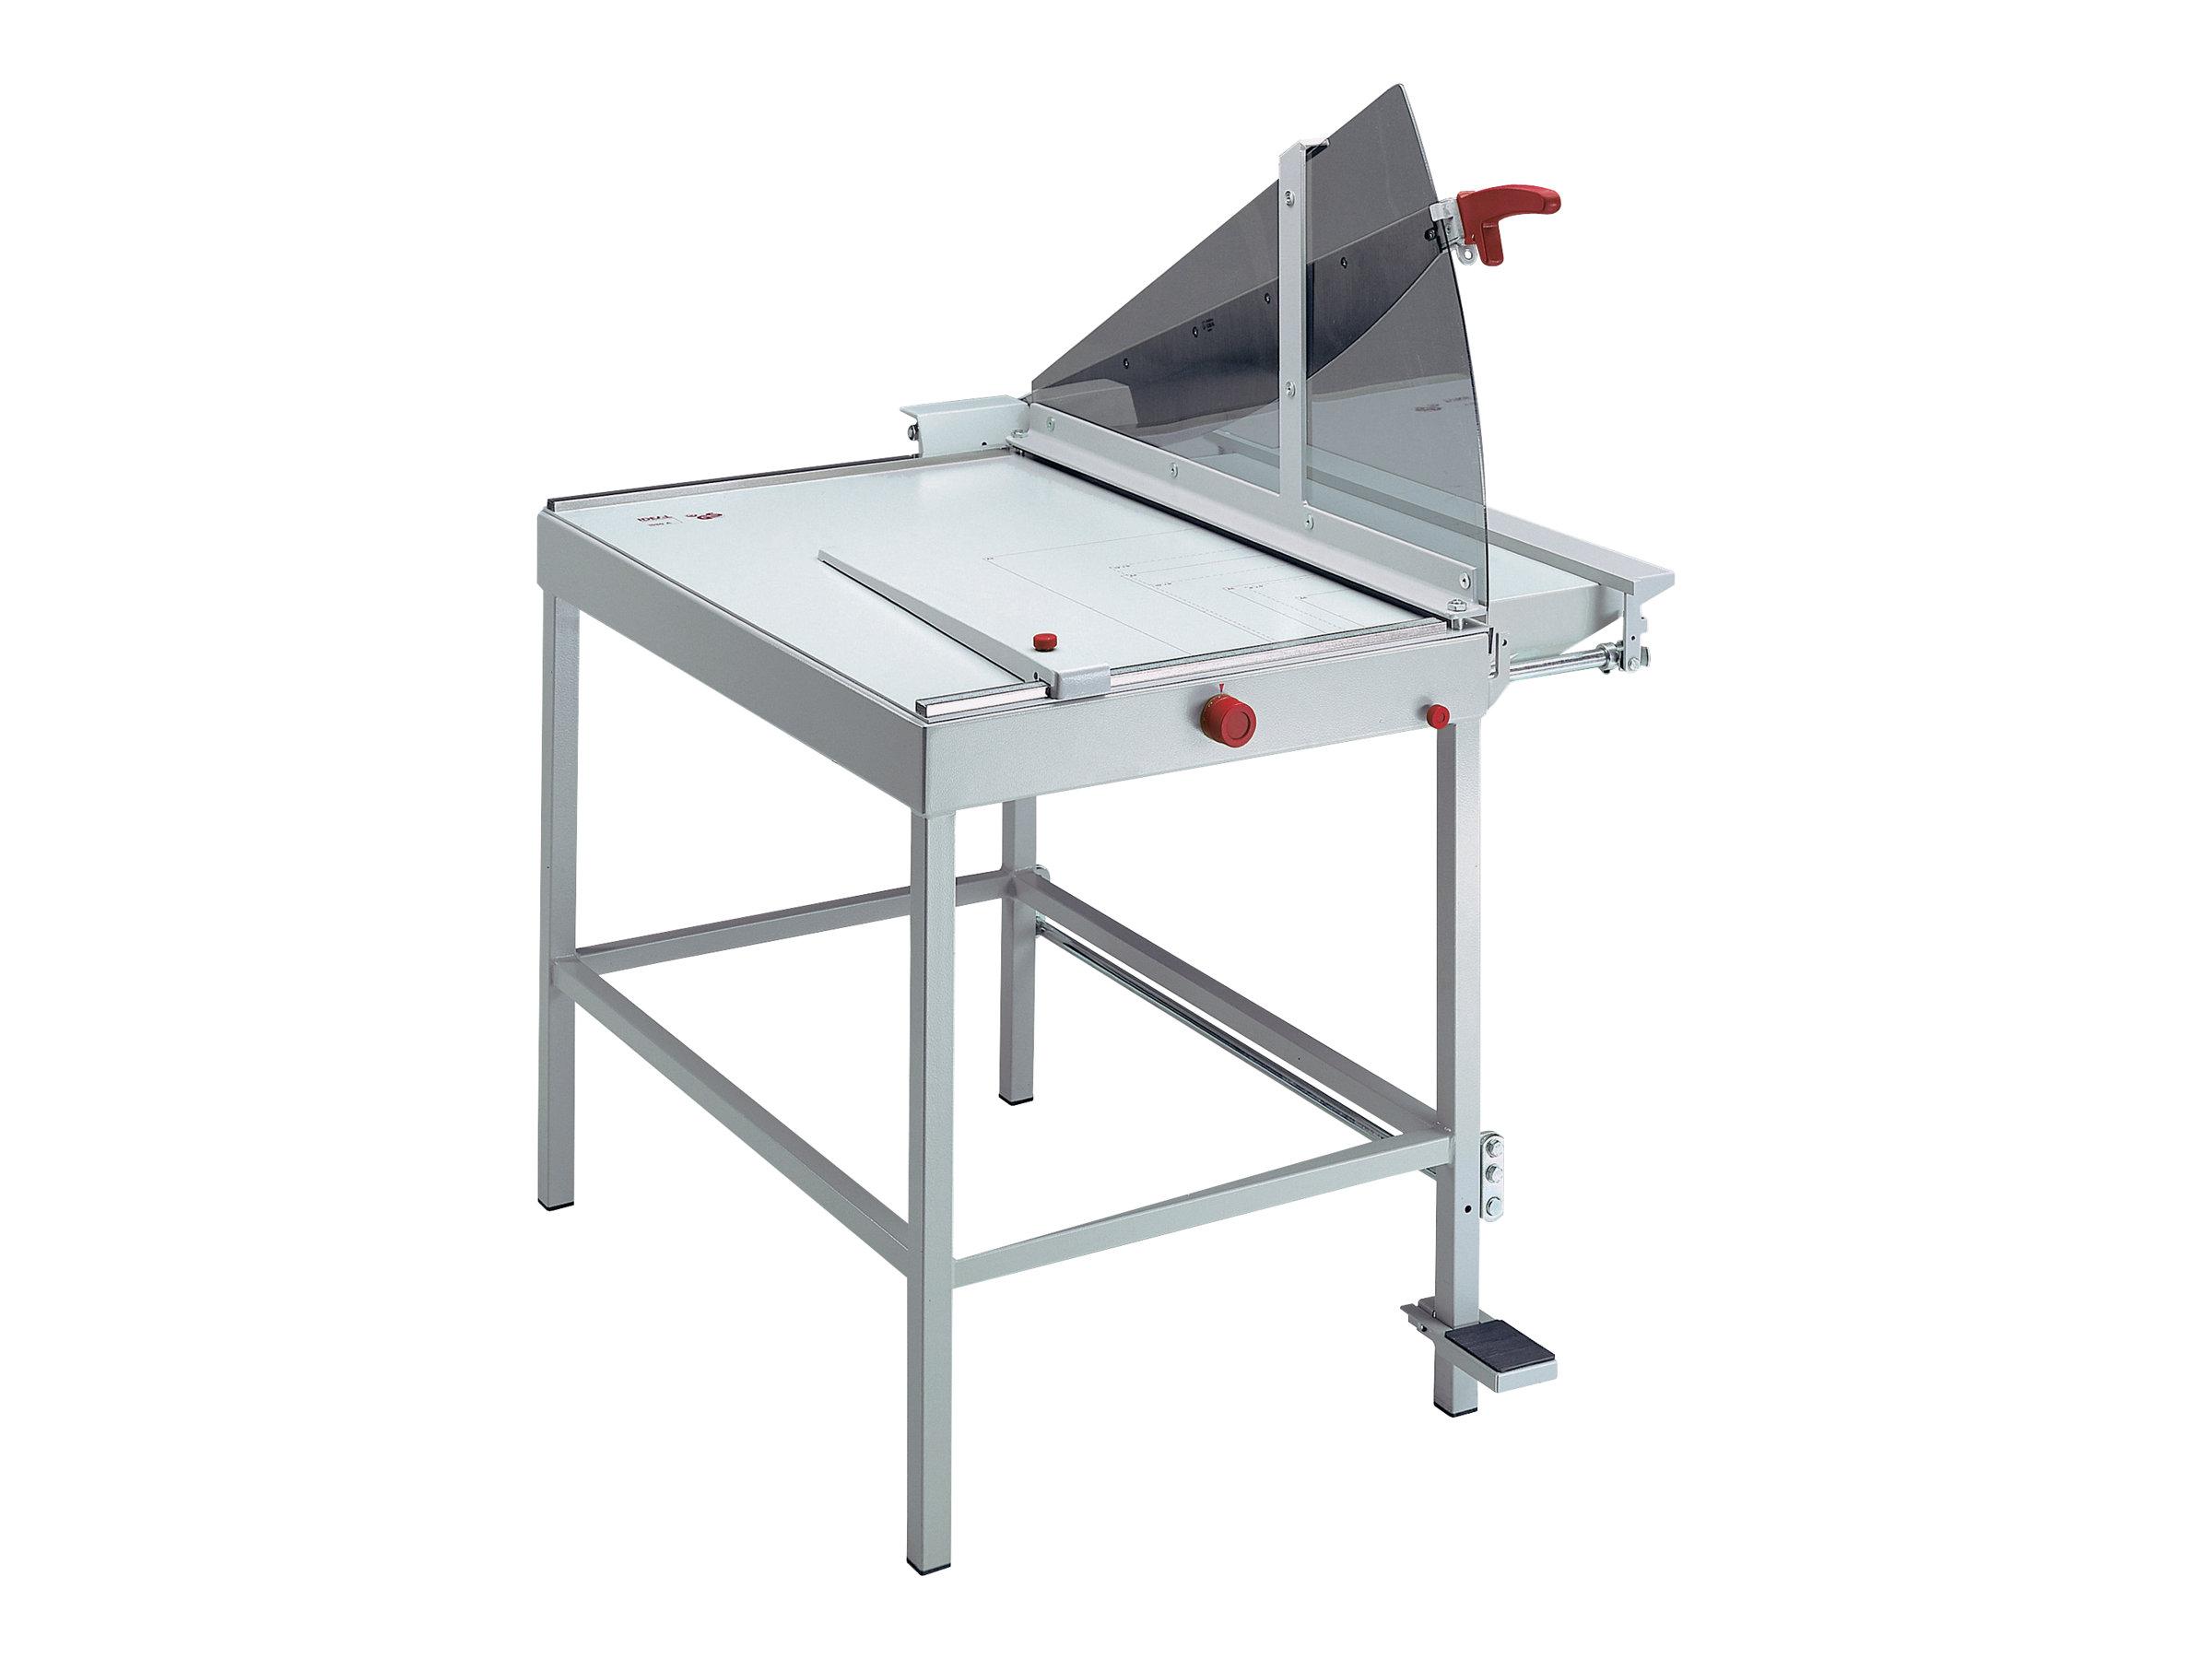 IDEAL 1080 - Schneideeinrichtung - 800 mm - Papier, Karton